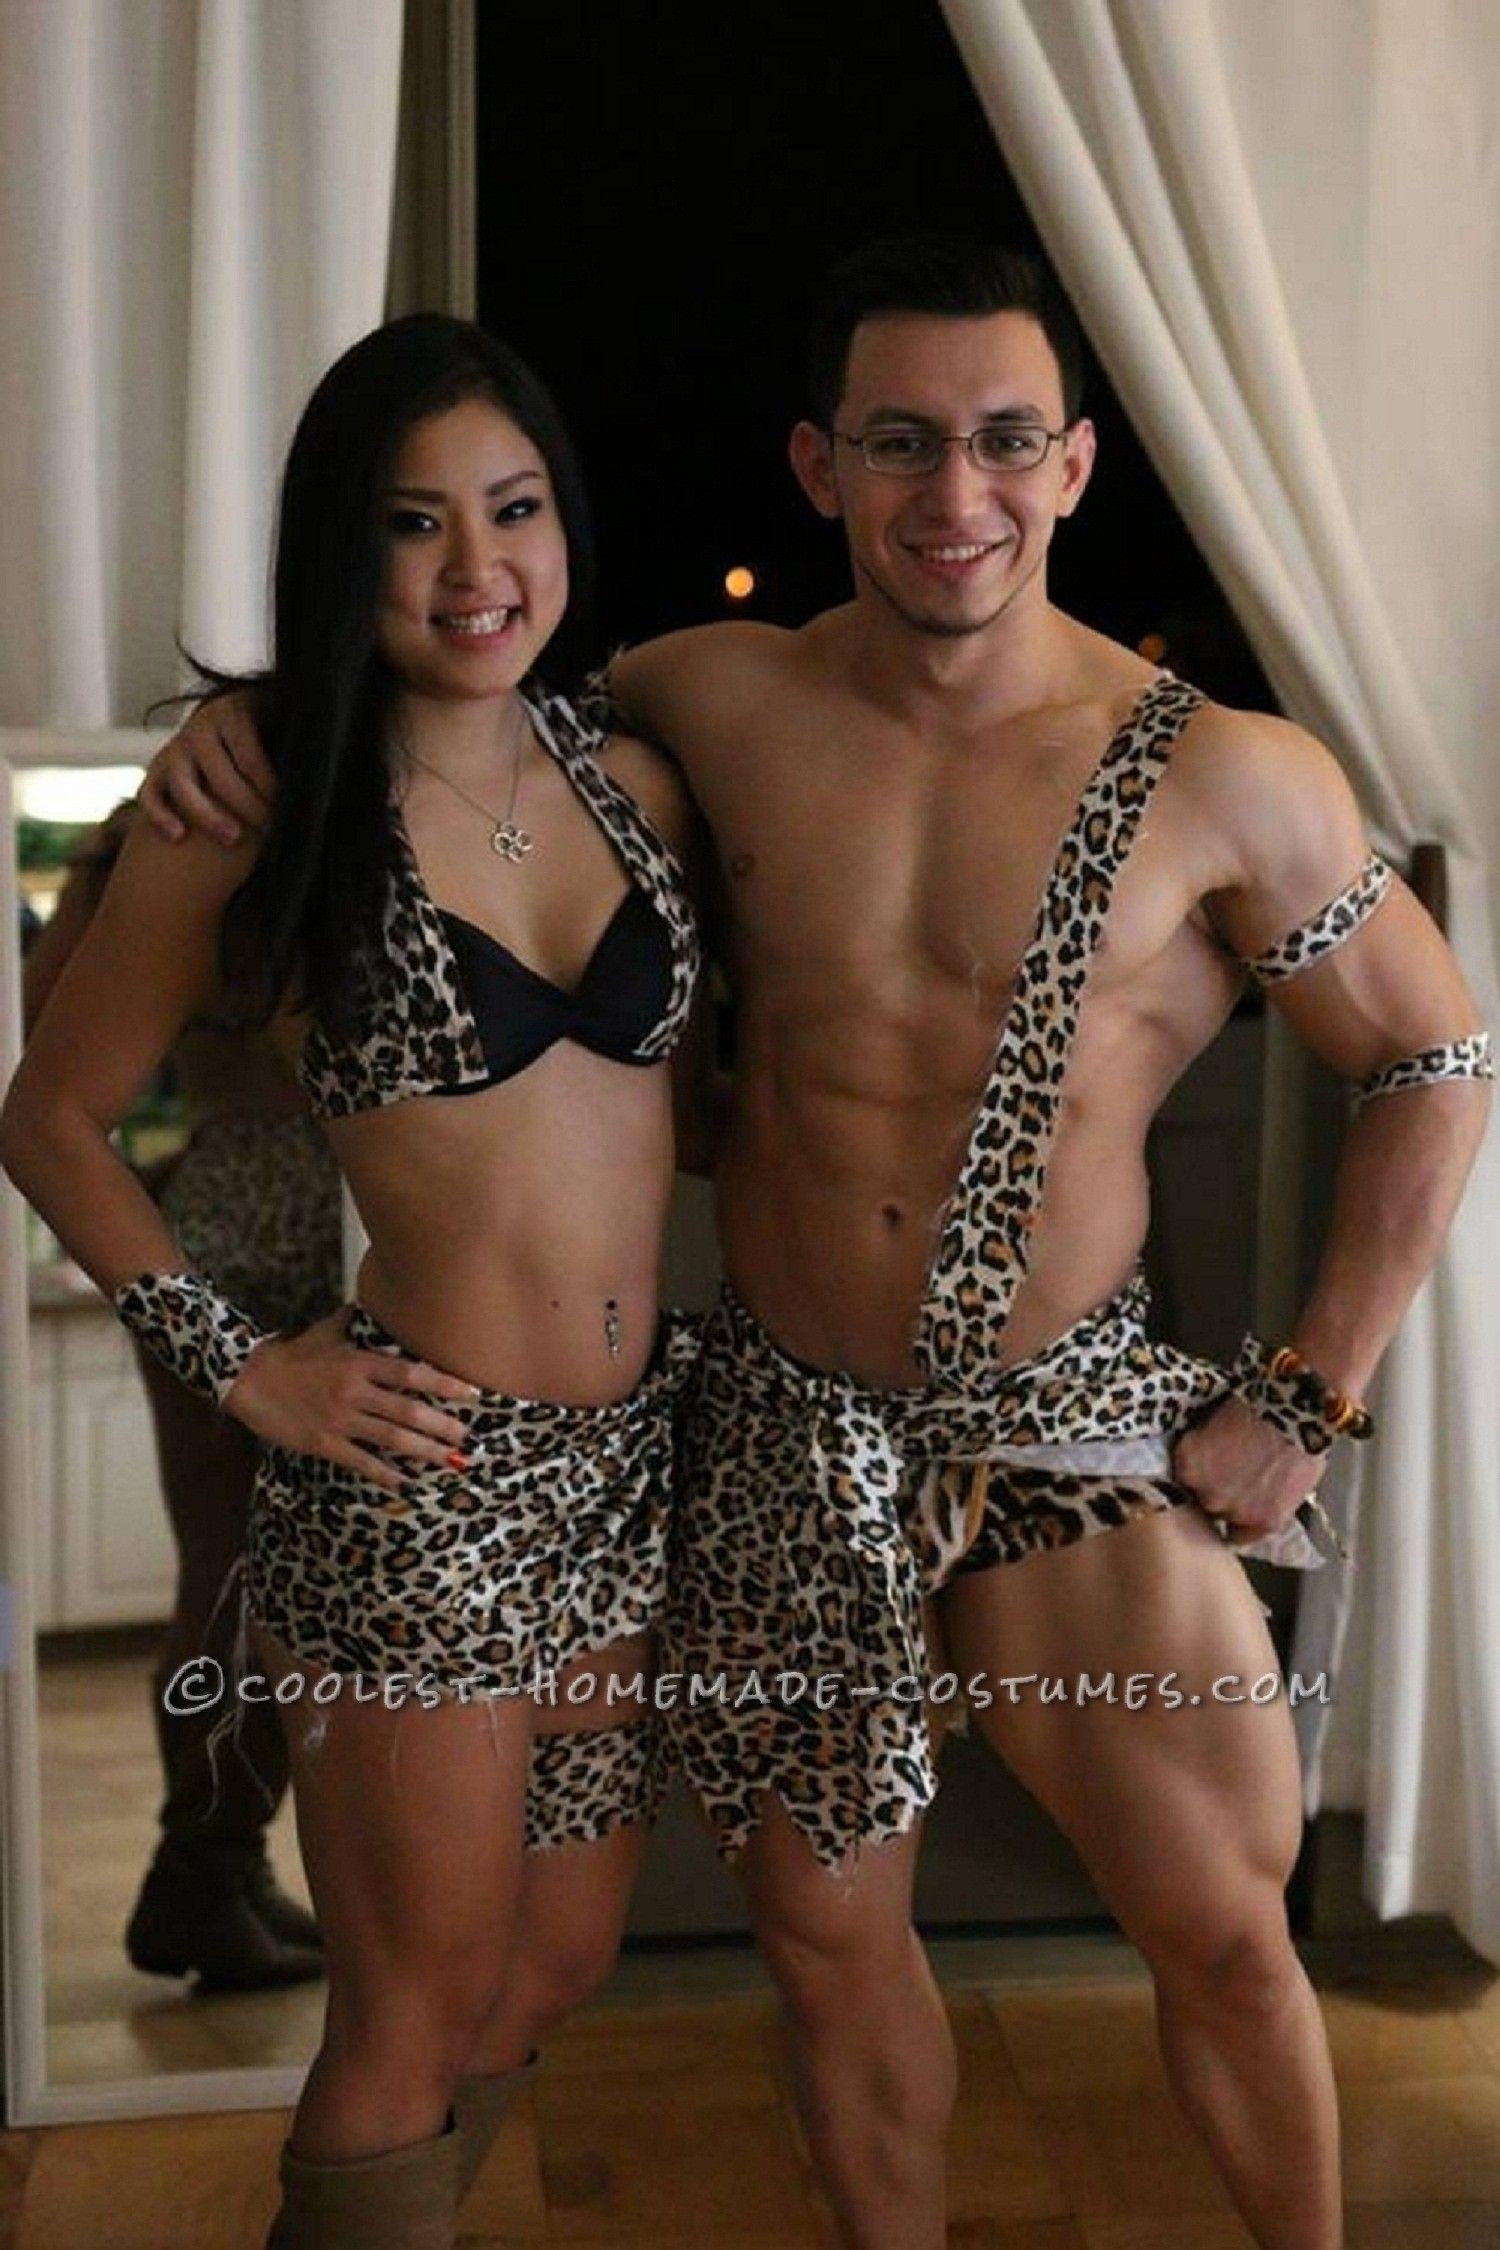 Caveman Halloween Costumes Couples